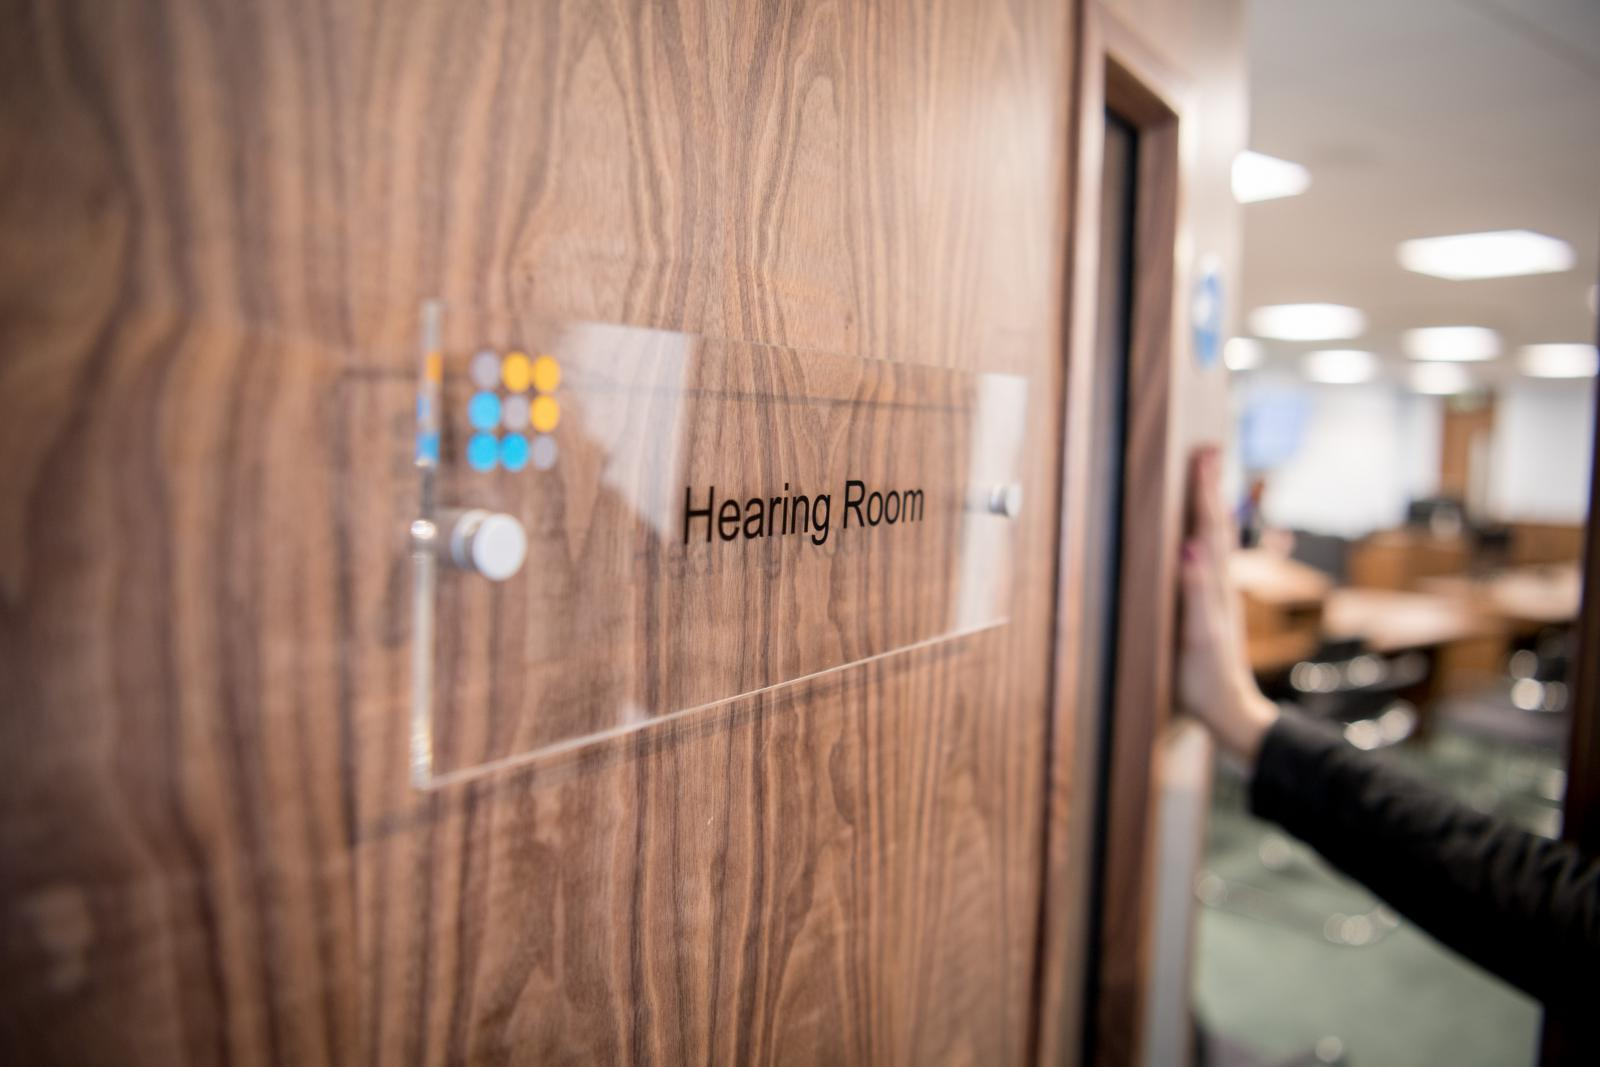 Public Hearings - Hearing Room